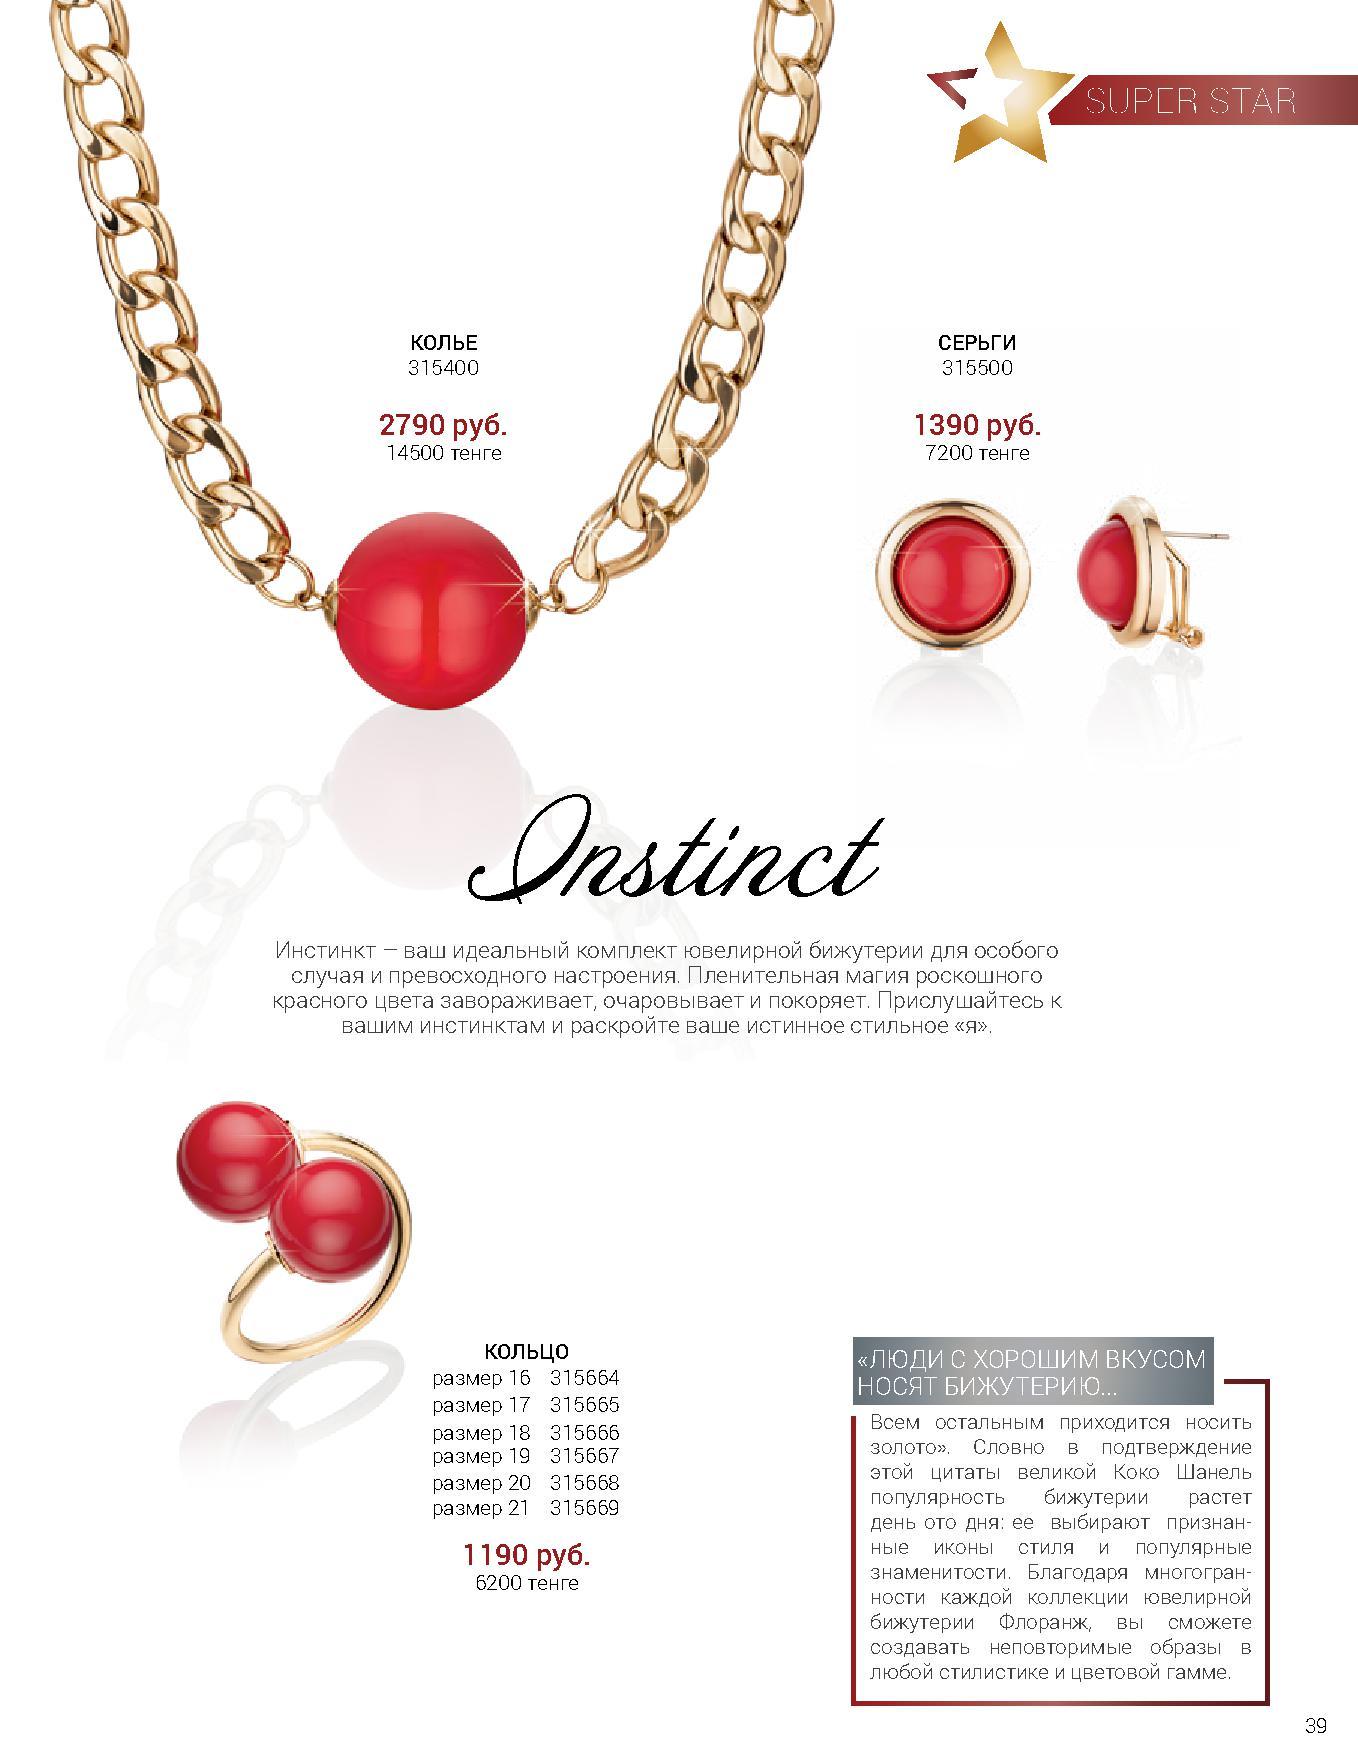 Флоранж - комплект Инстинкт - колье, серьги и кольцо